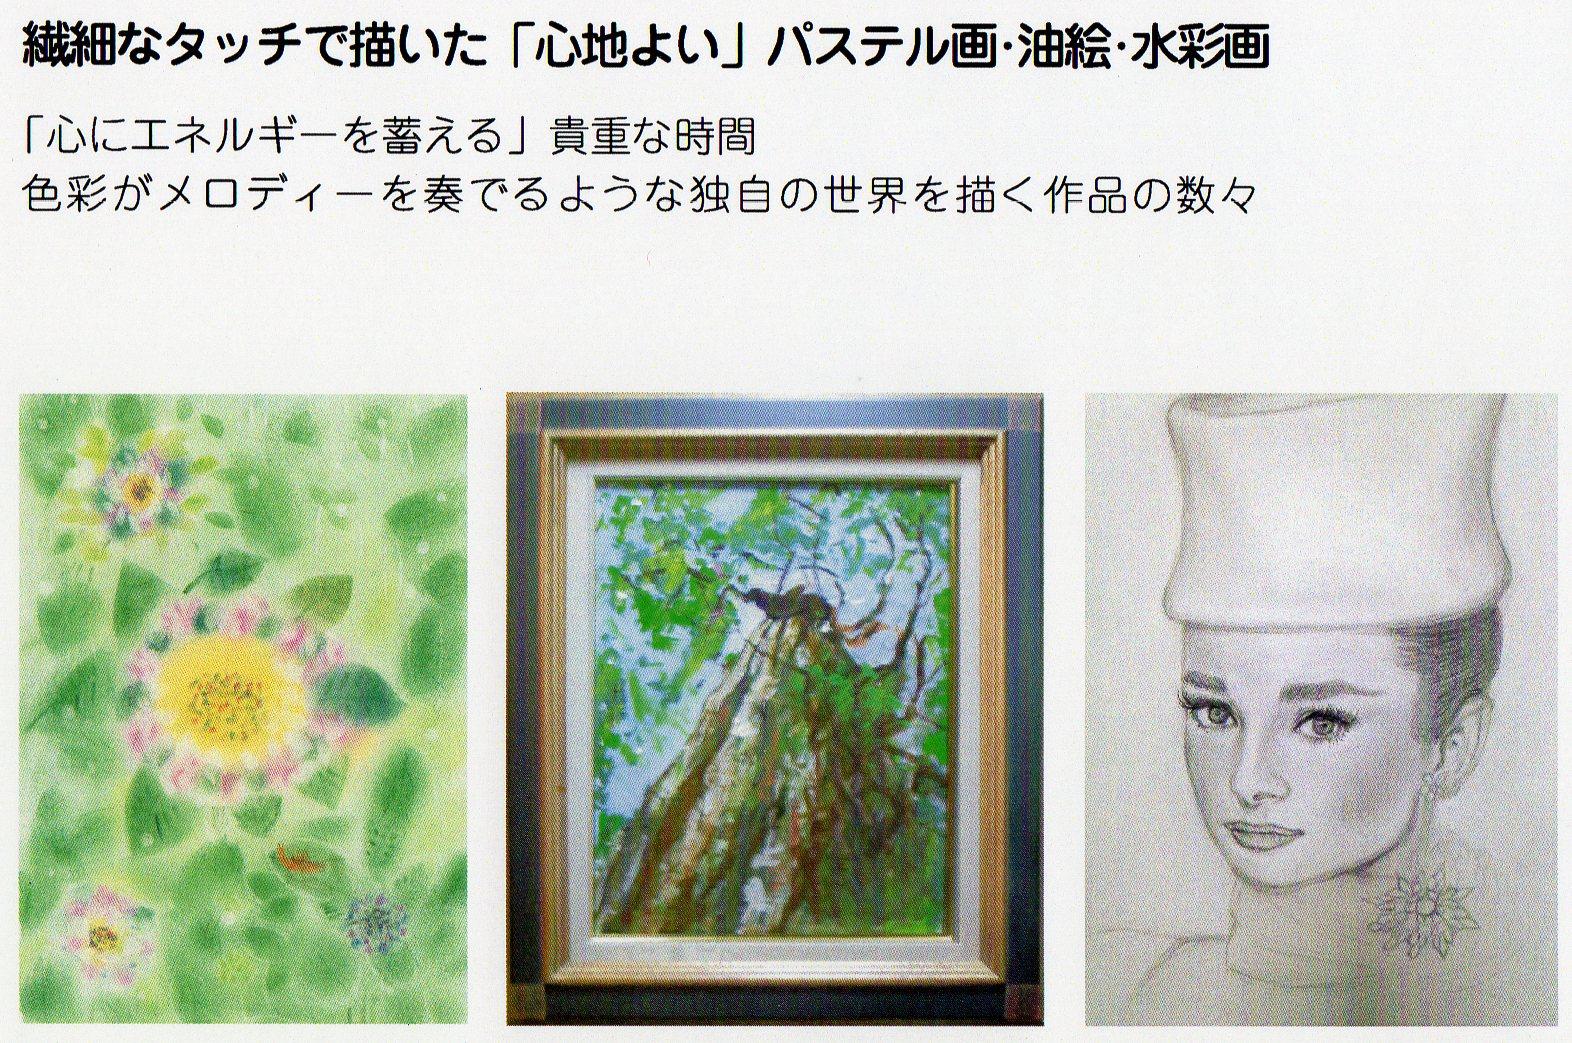 kuthumiグループのアート展